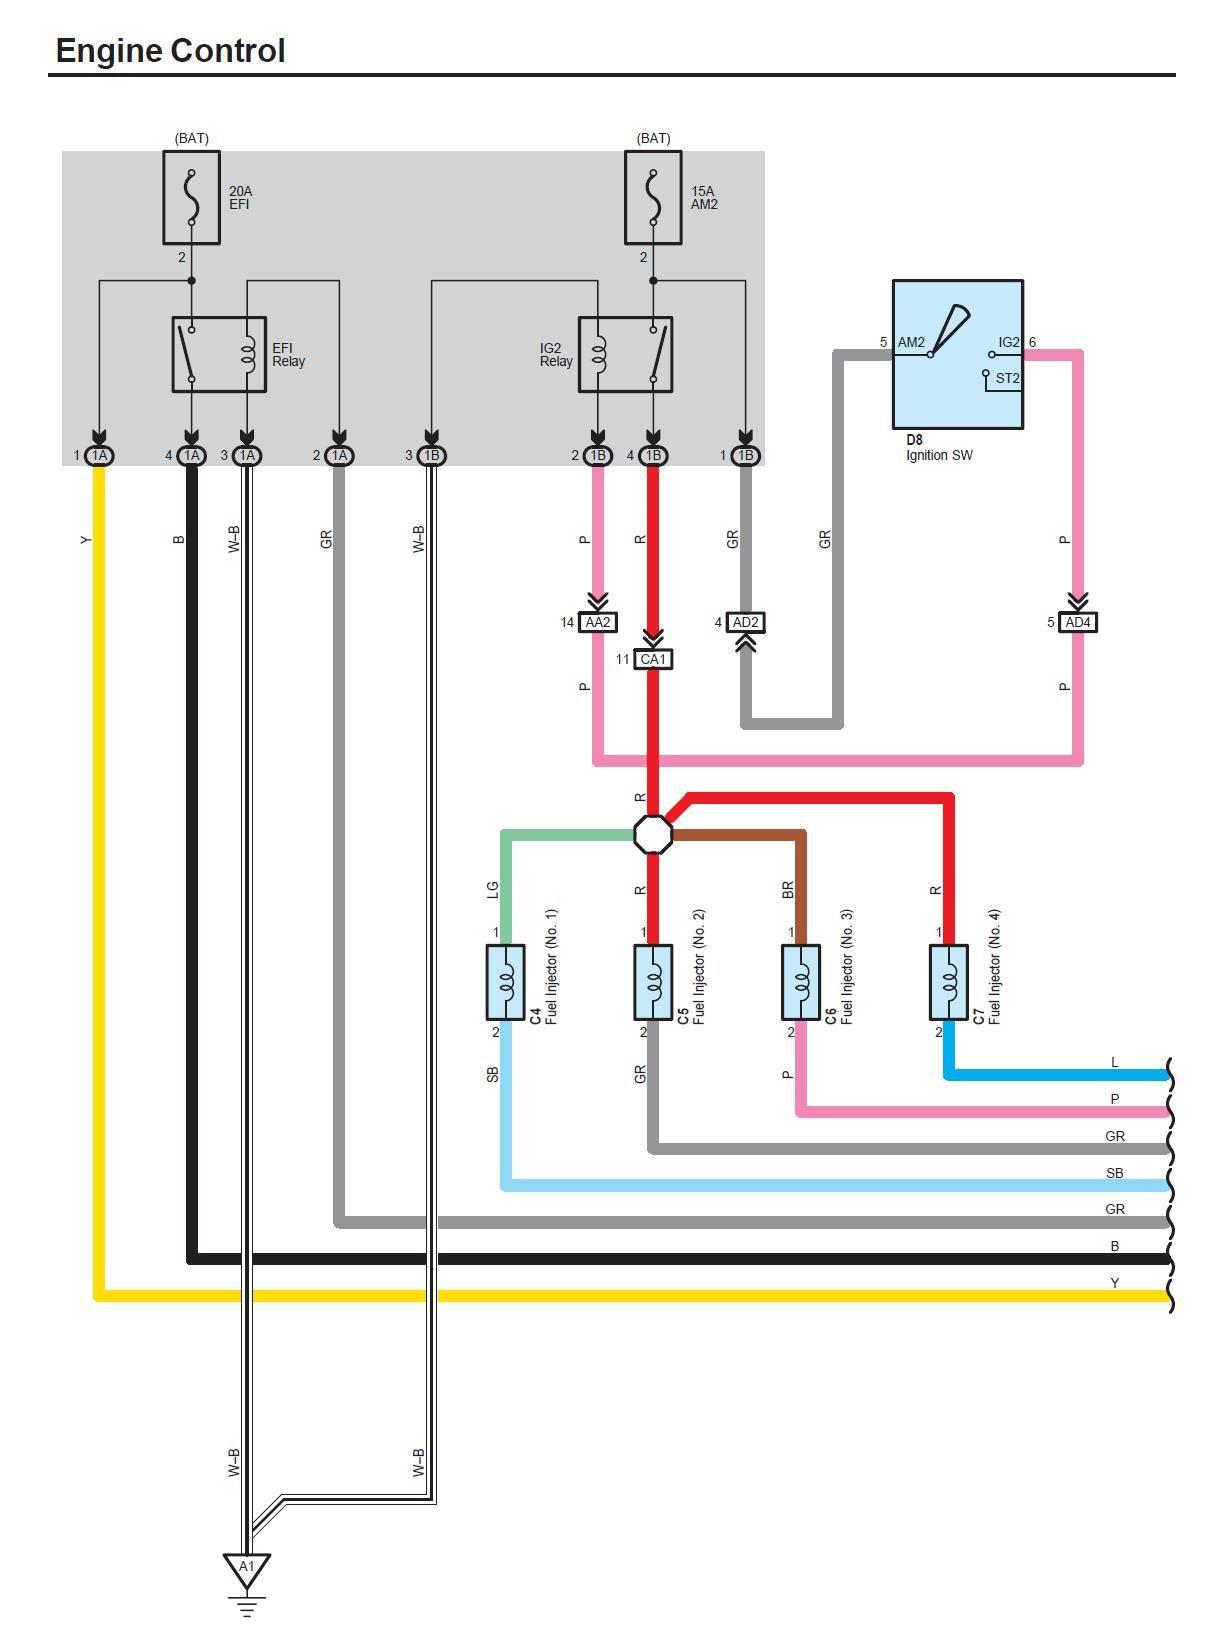 ro_3460] toyota yaris radio wiring diagram how to install a car ... wiring diagram toyota yaris 2008  ratag chro ehir vesi xrenket rect mohammedshrine librar wiring 101